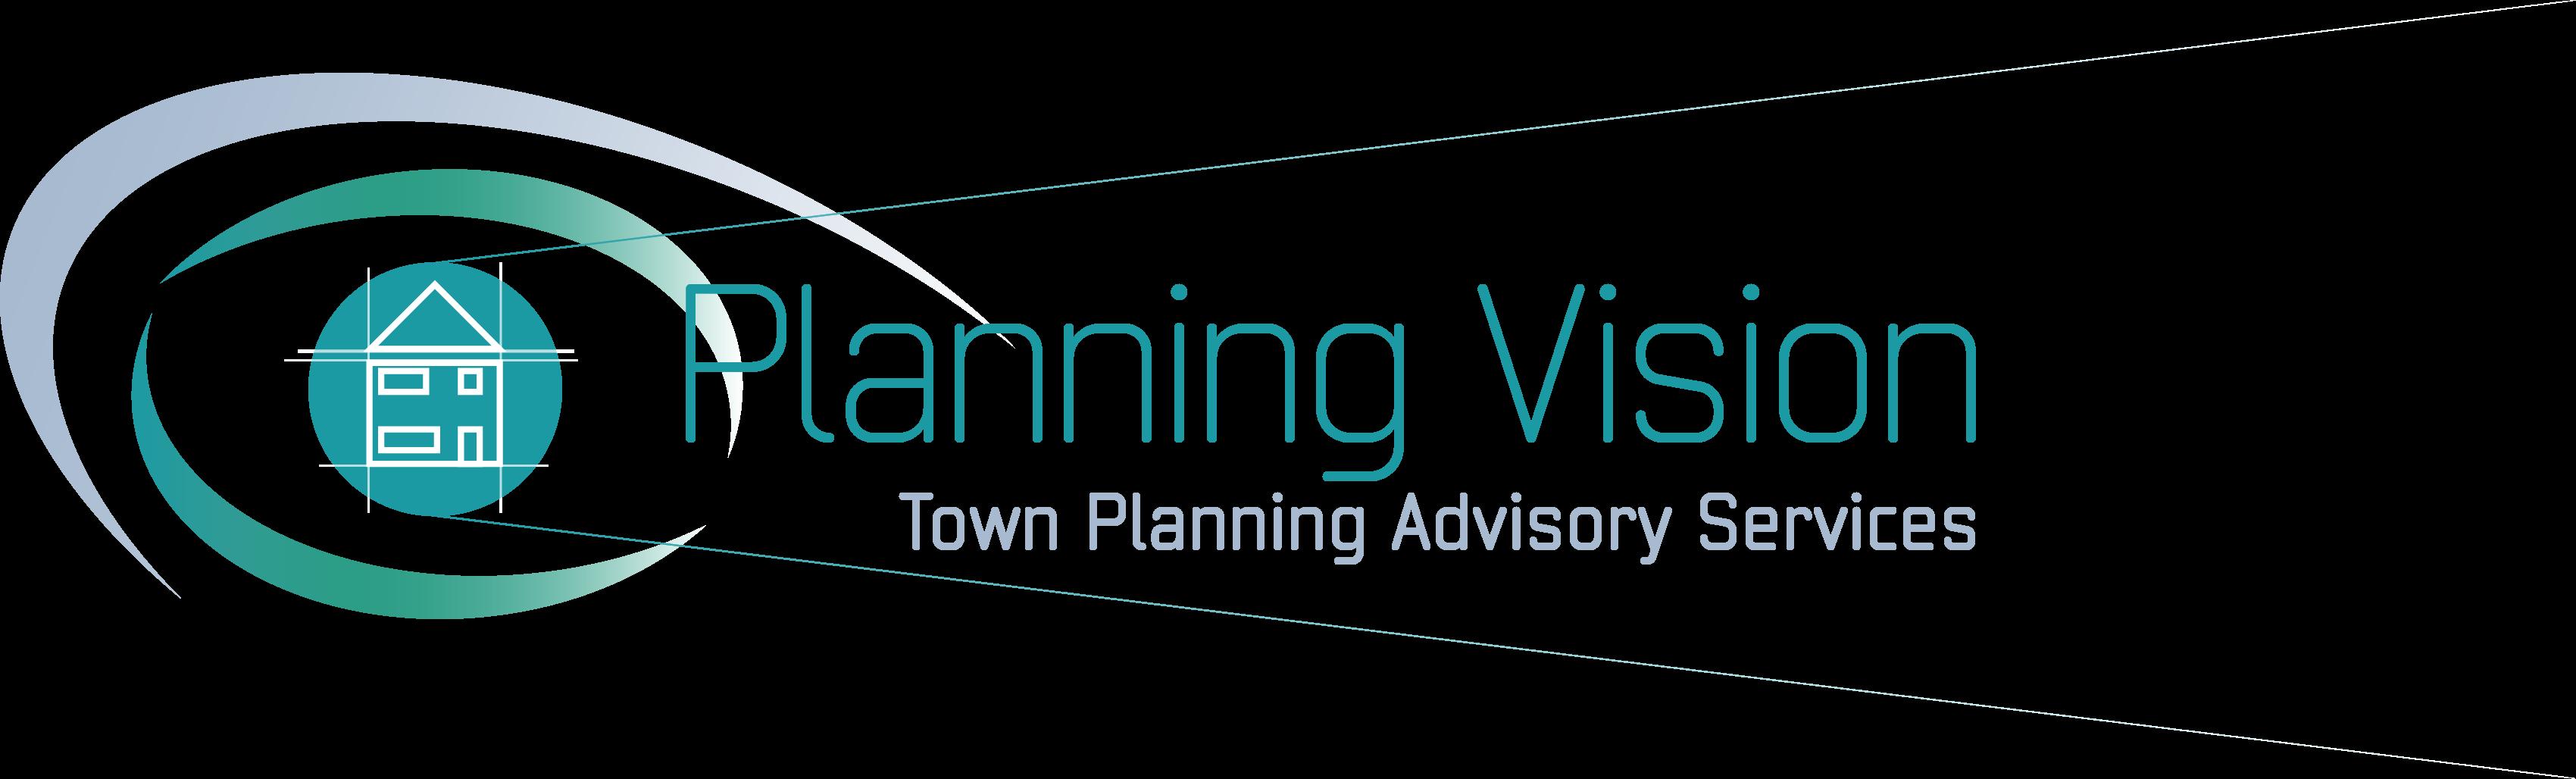 Planning Vision Logo